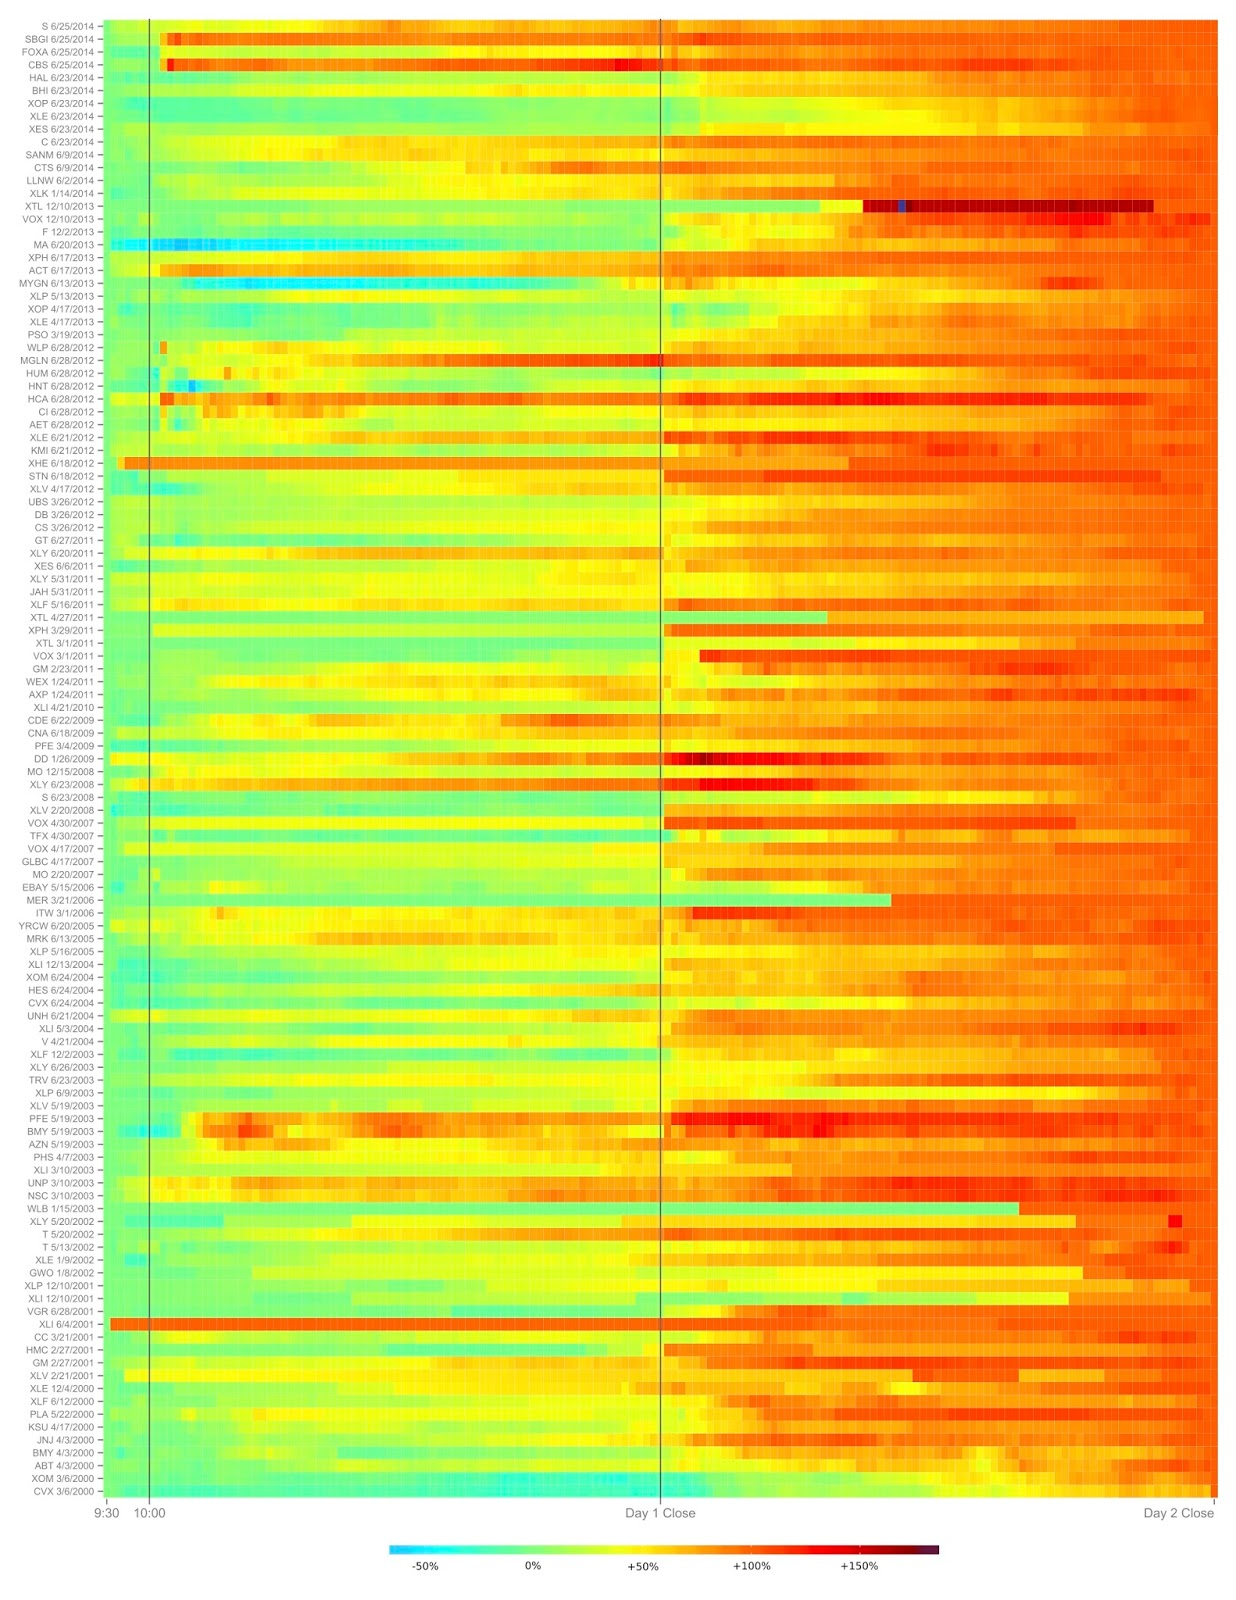 LOTM heatmap